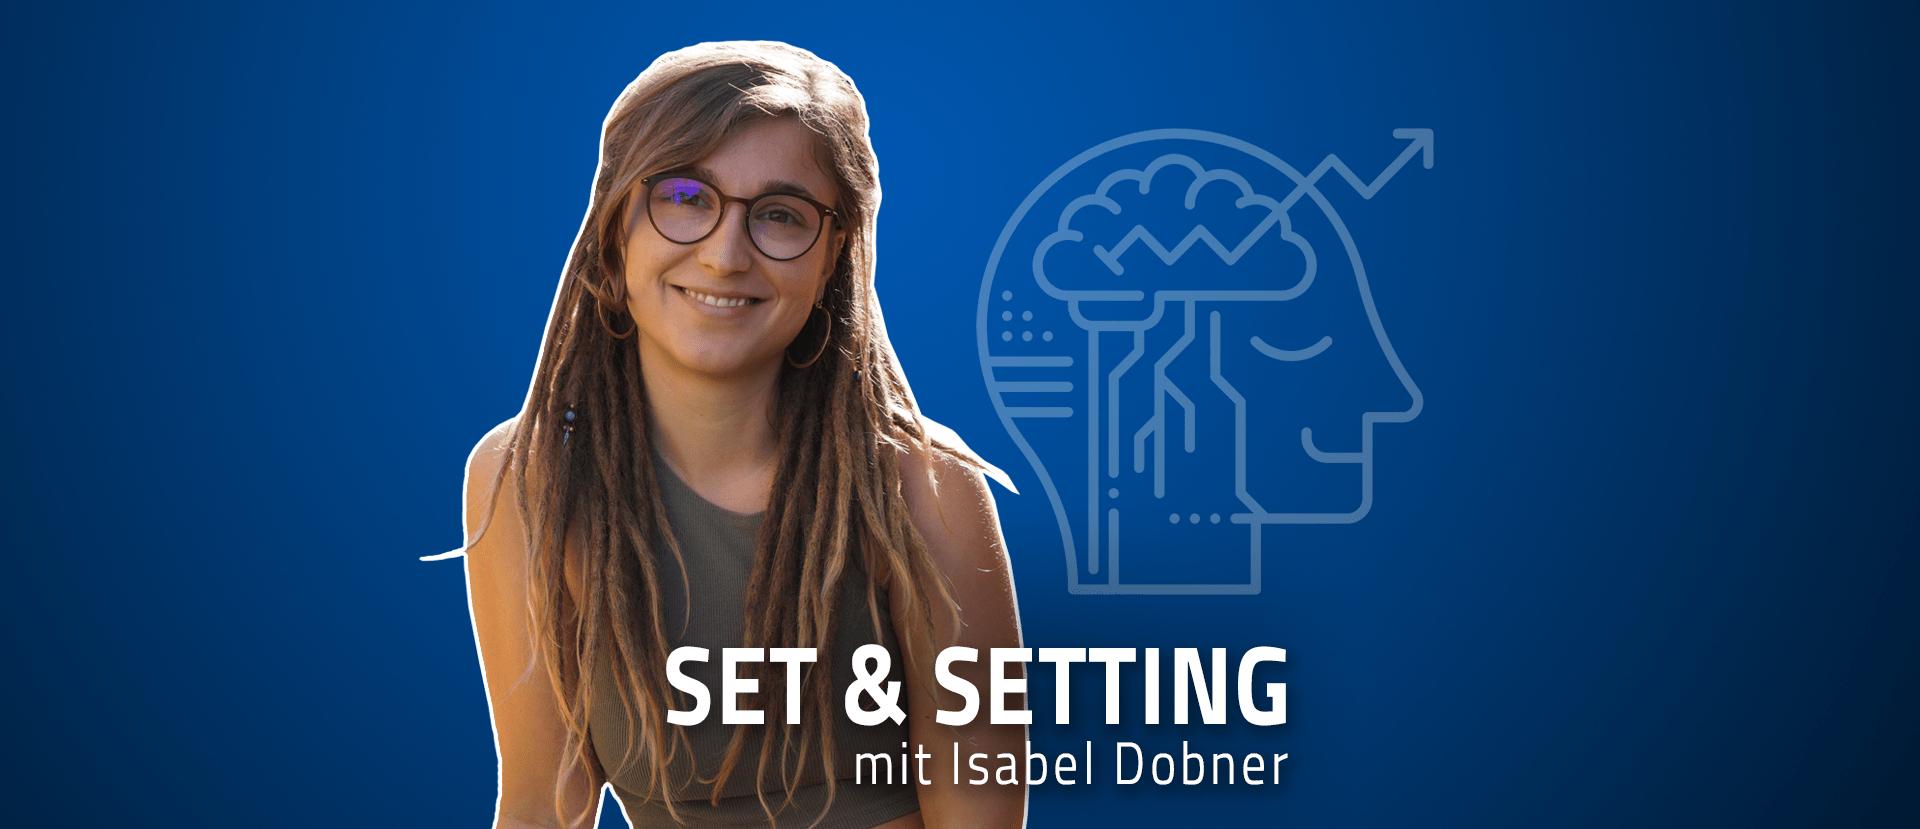 Isabel Dobner Set Setting Podcast Psychedelika Weiblichkeit